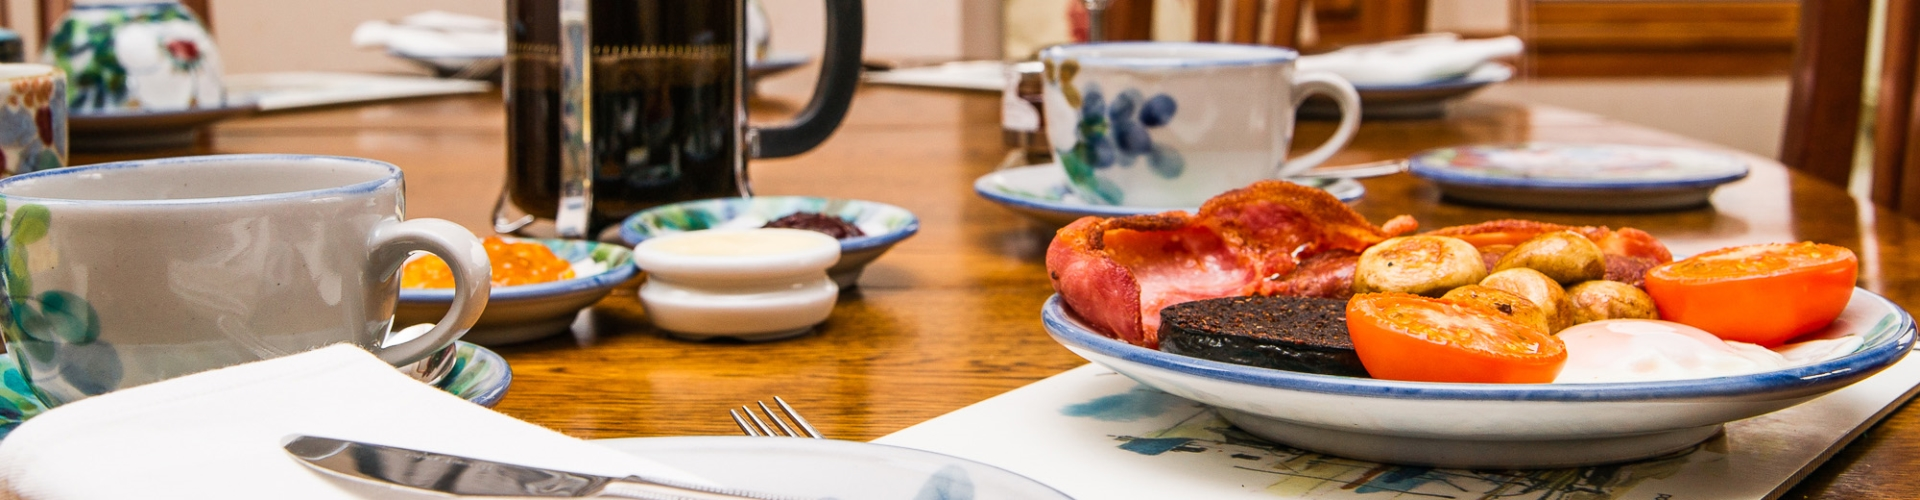 Ladysmith Bed And Breakfast Ullapool